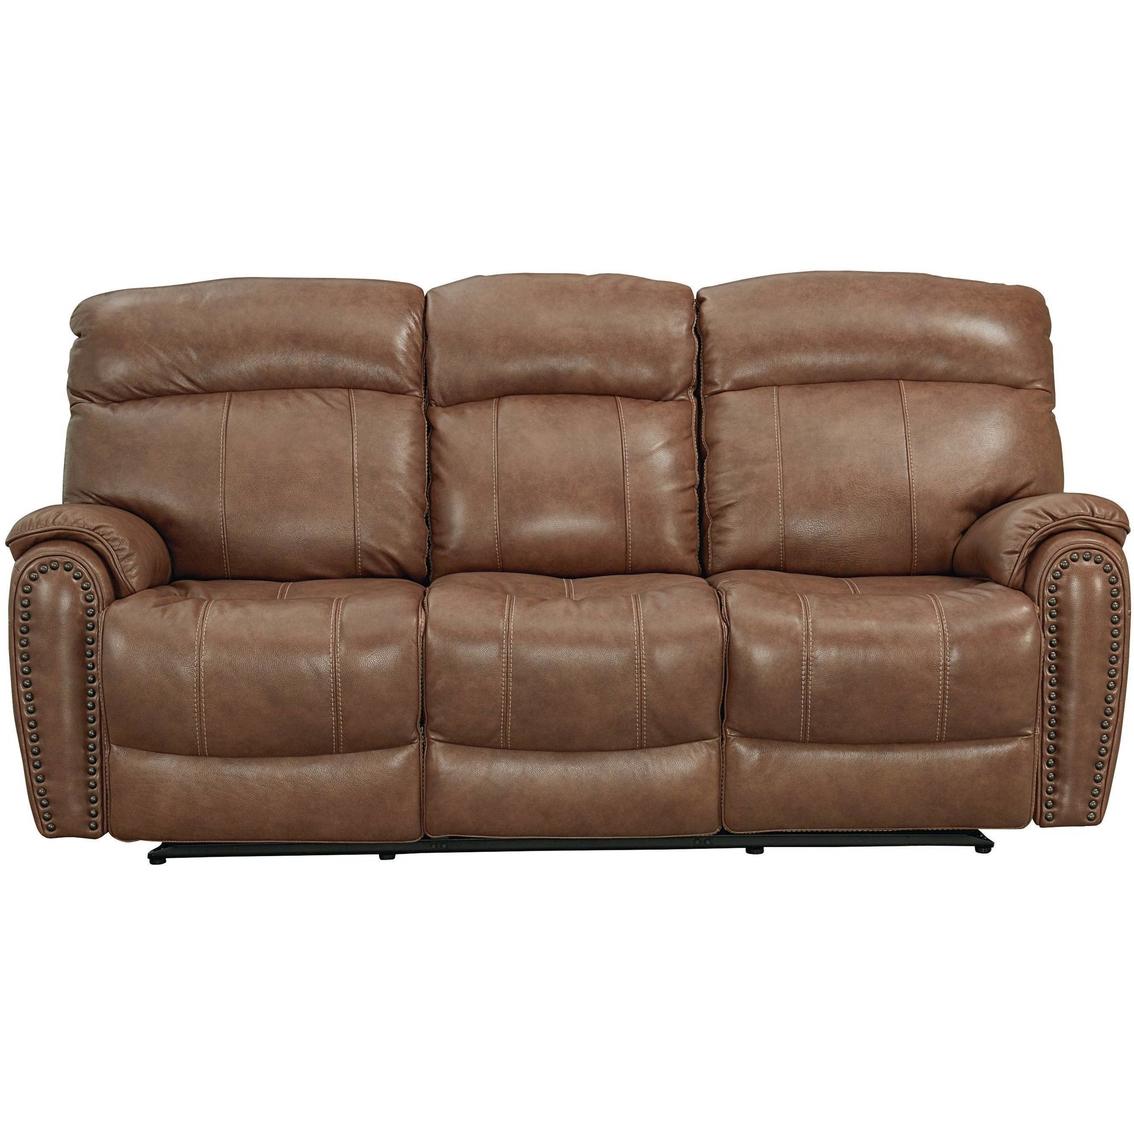 Groovy Bassett Club Level Bridgeport Power Reclining Sofa Sofas Gamerscity Chair Design For Home Gamerscityorg